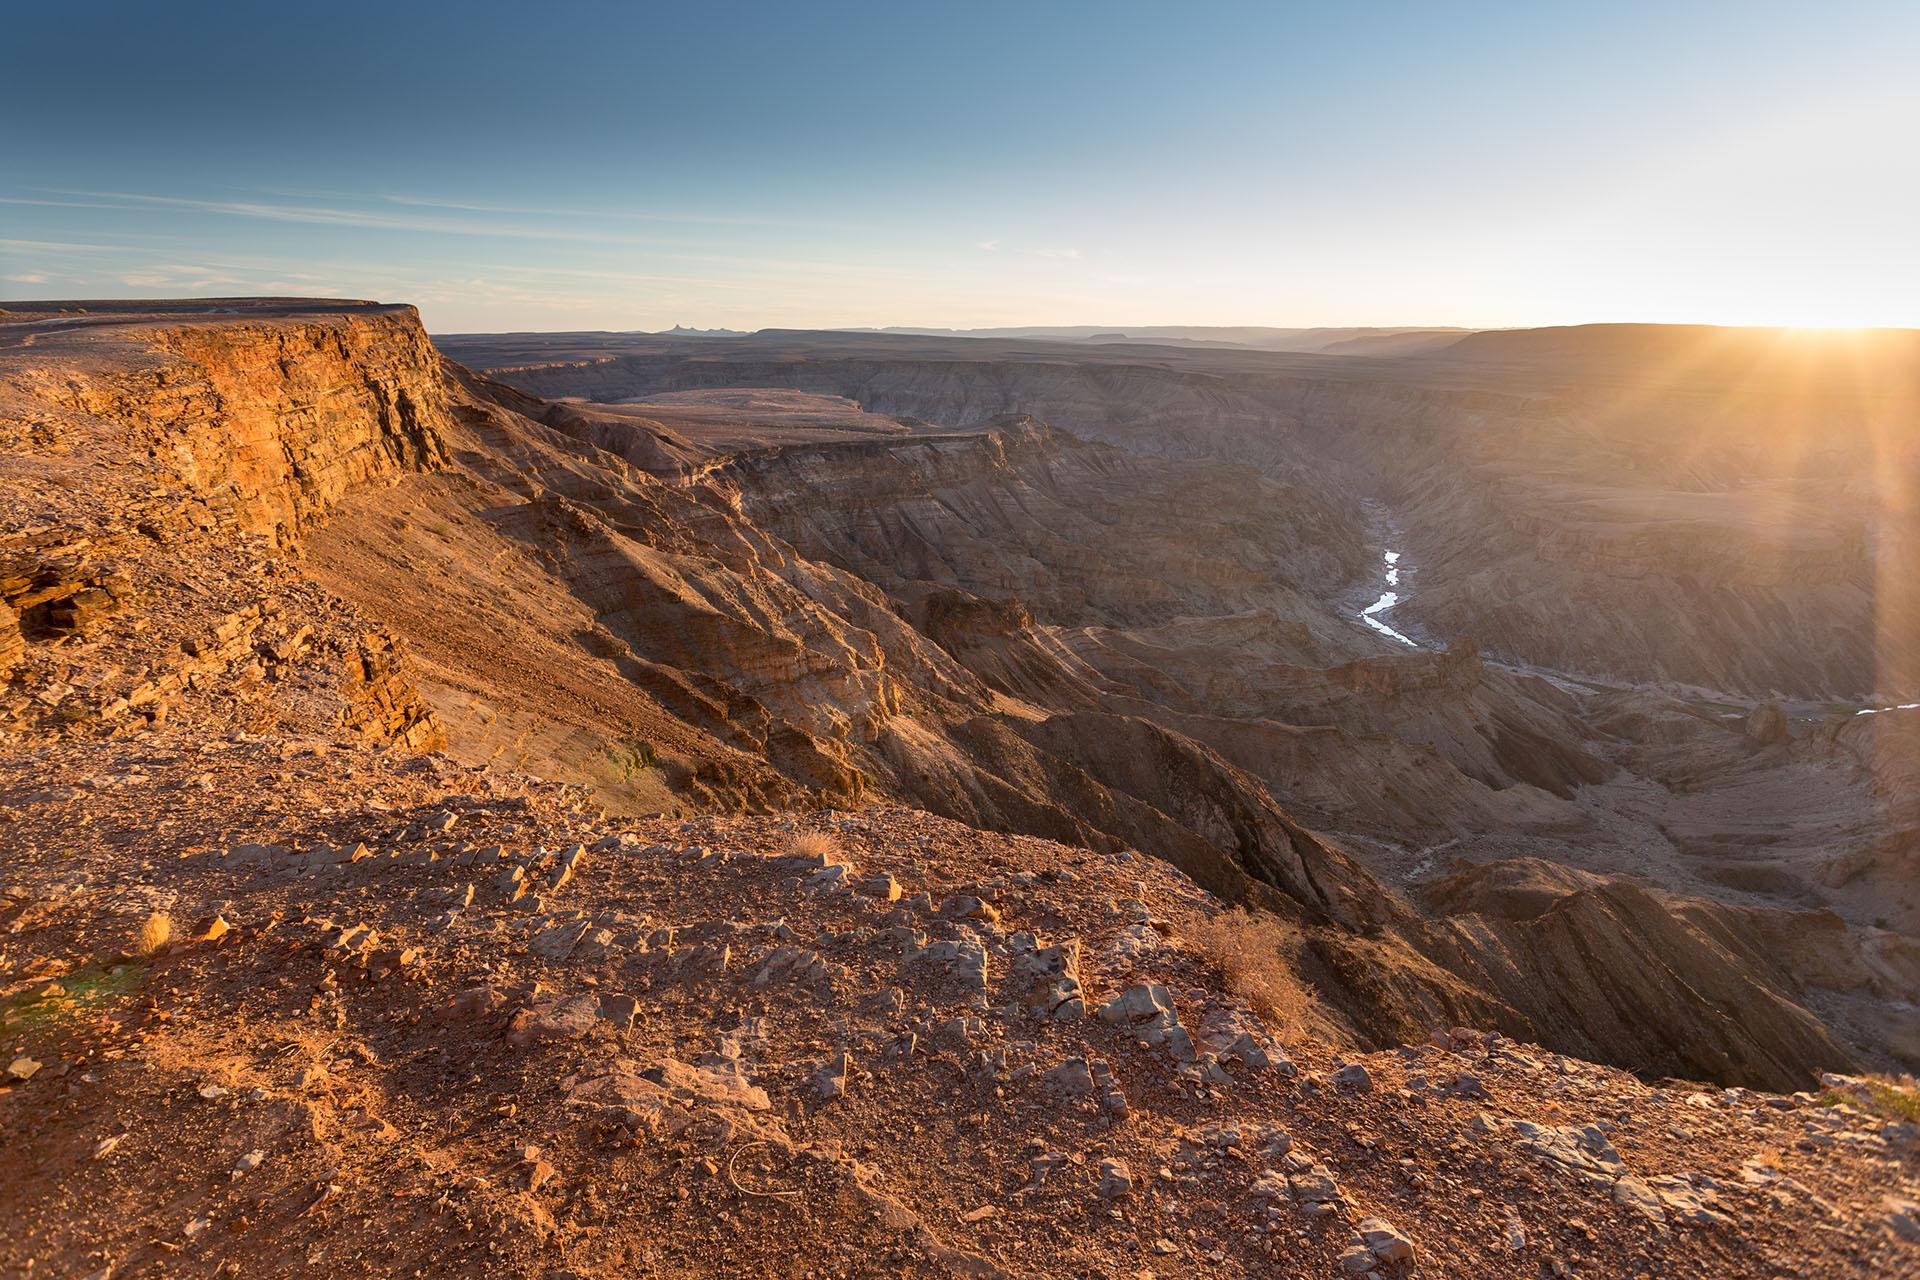 Fischfluss Canyon Namibia, Namibia Top 10